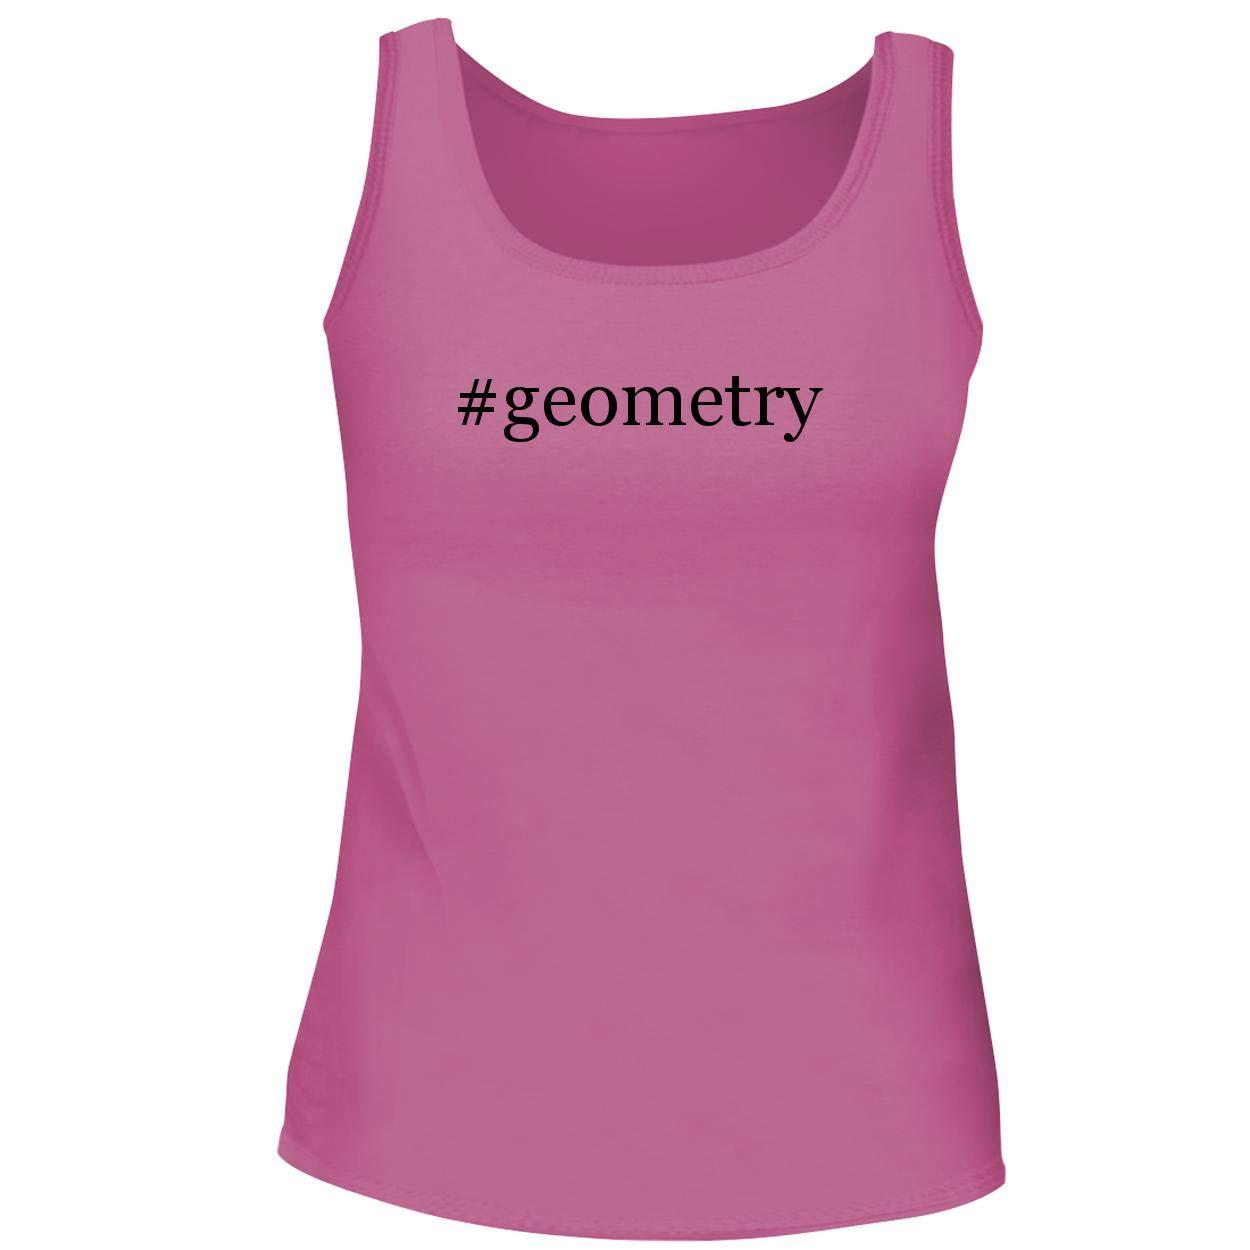 BH Cool Designs #Geometry - Cute Women